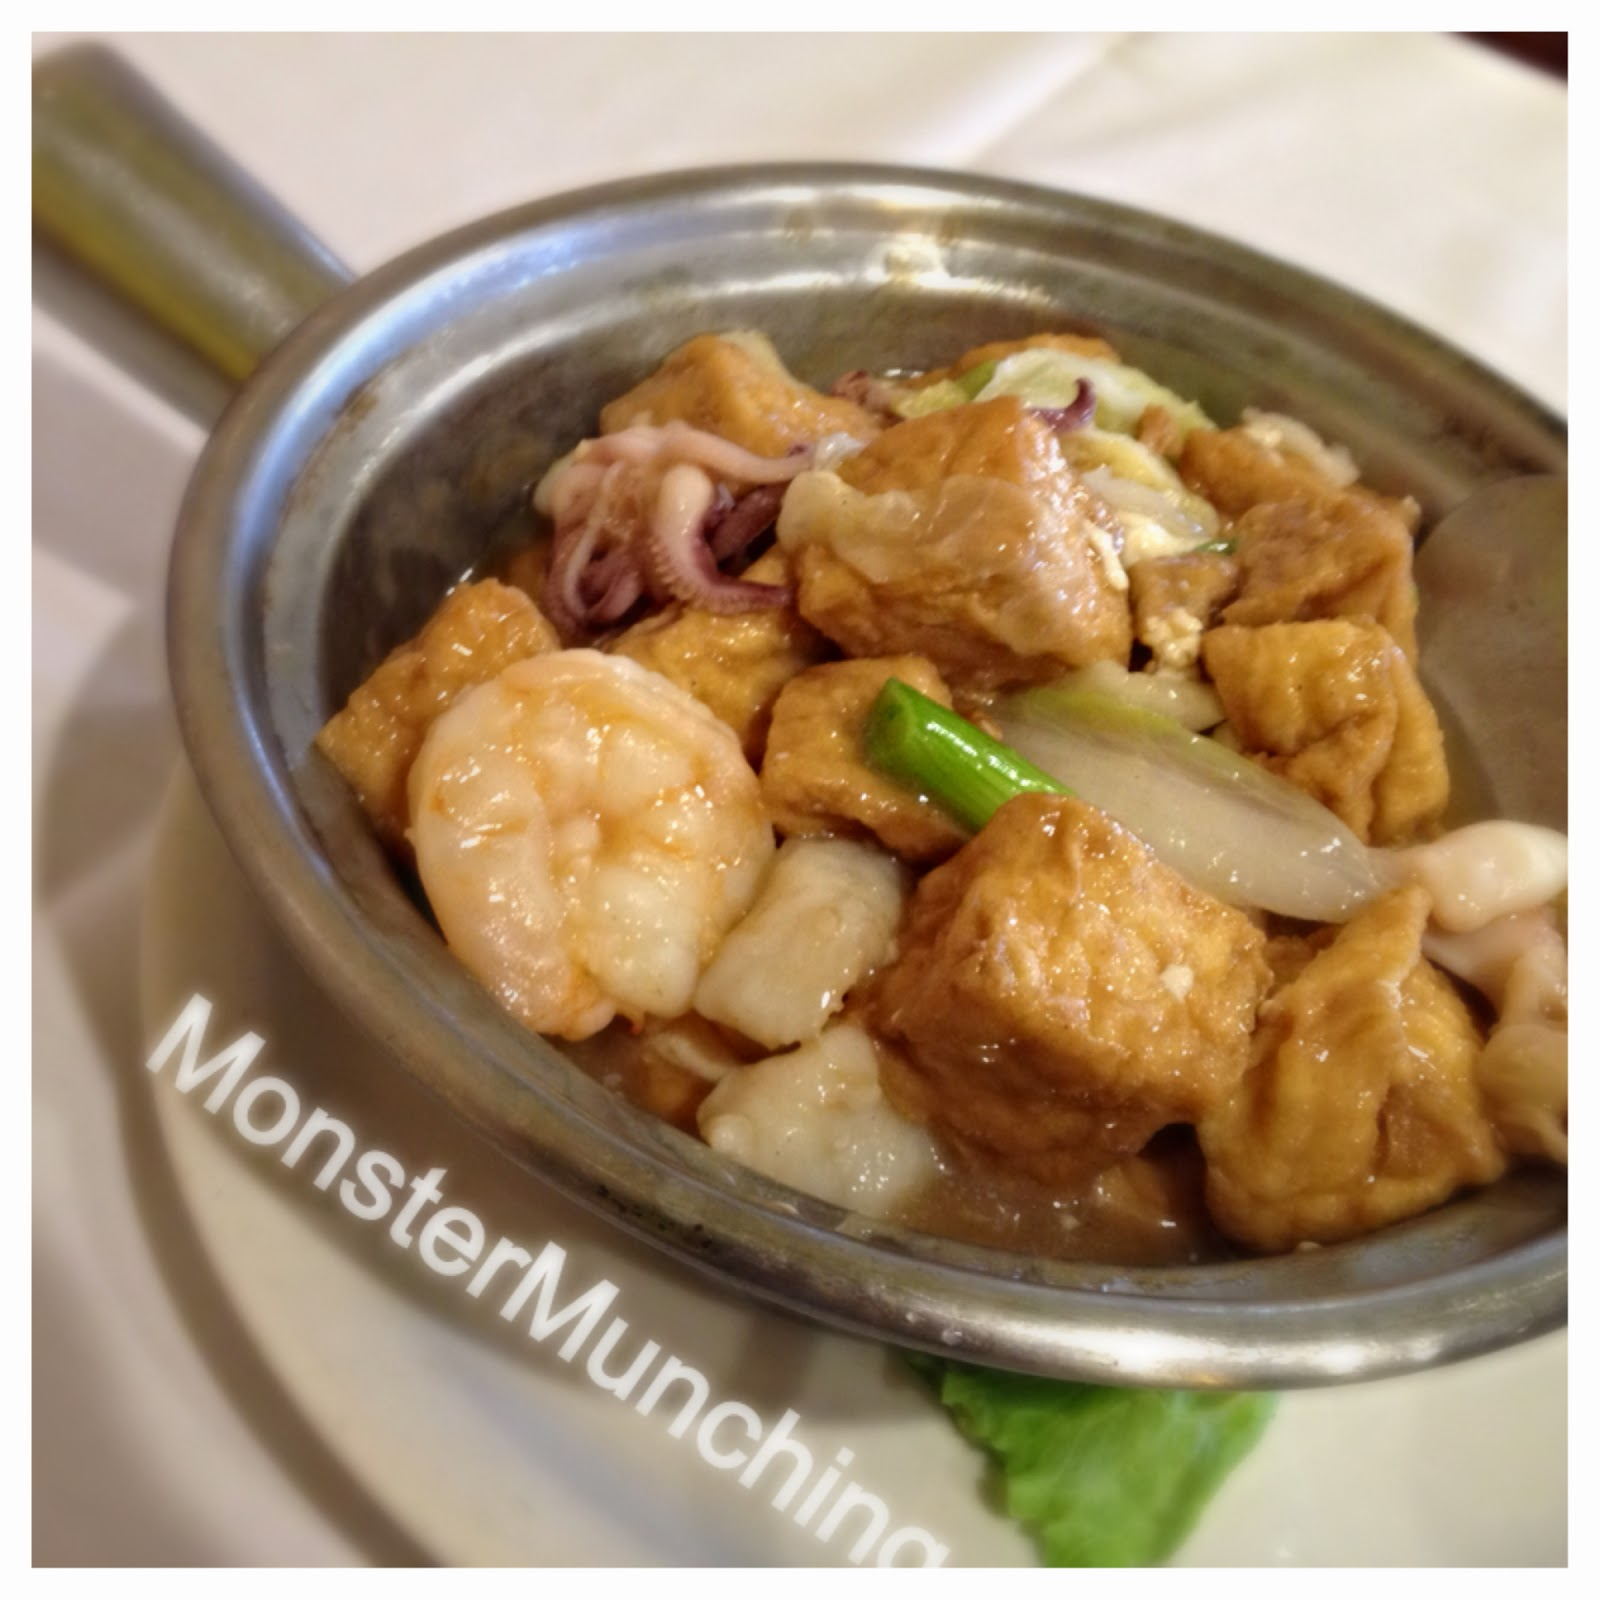 Monster Munching: Sam Woo Seafood & BBQ - Cerritos